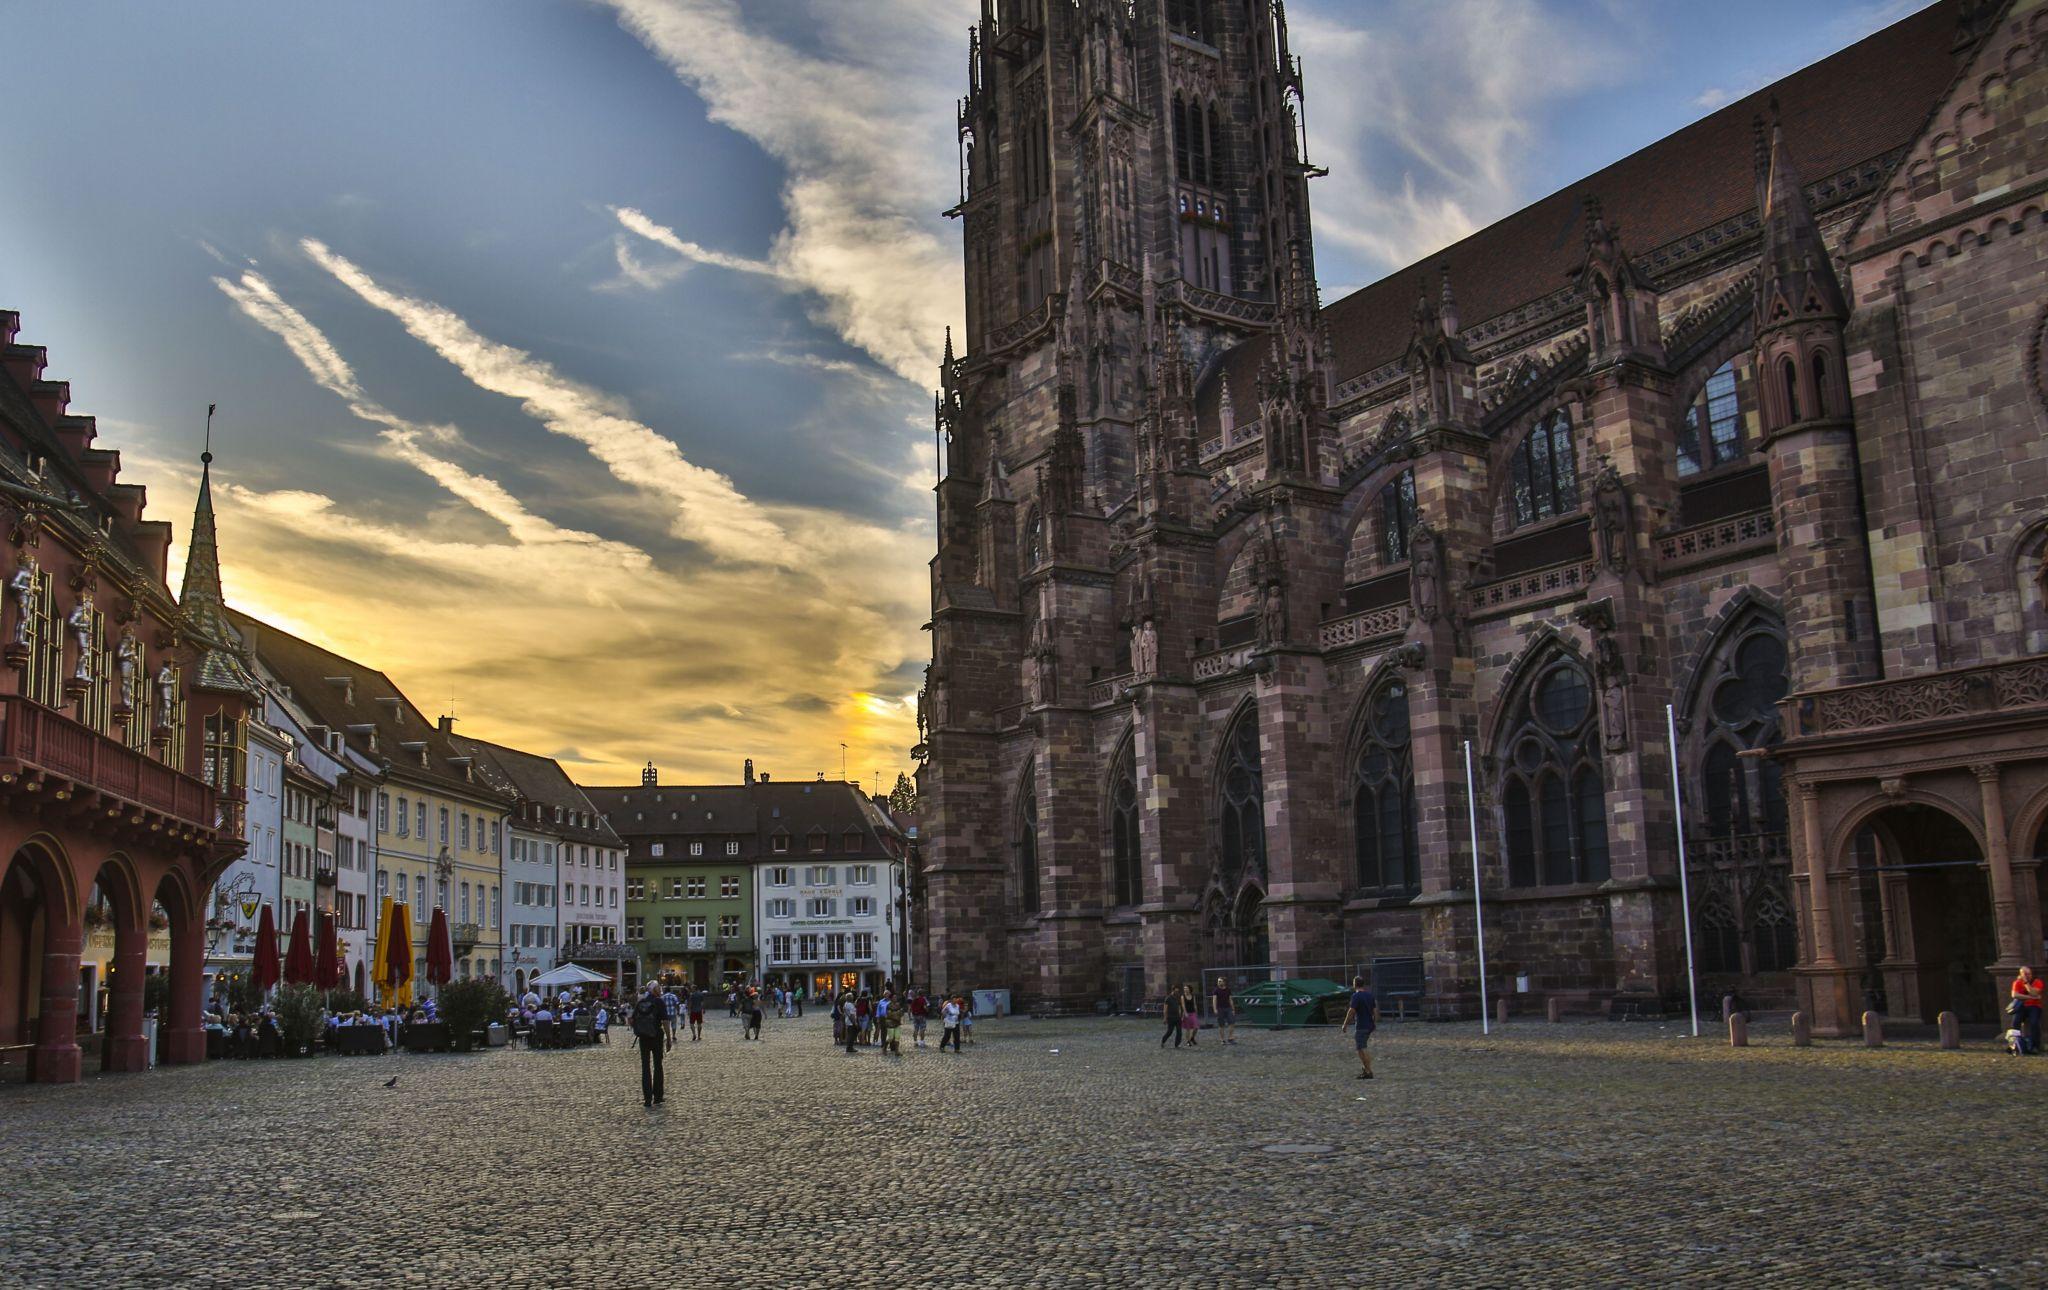 Freiburger Münster / Freiburg Minster, Germany